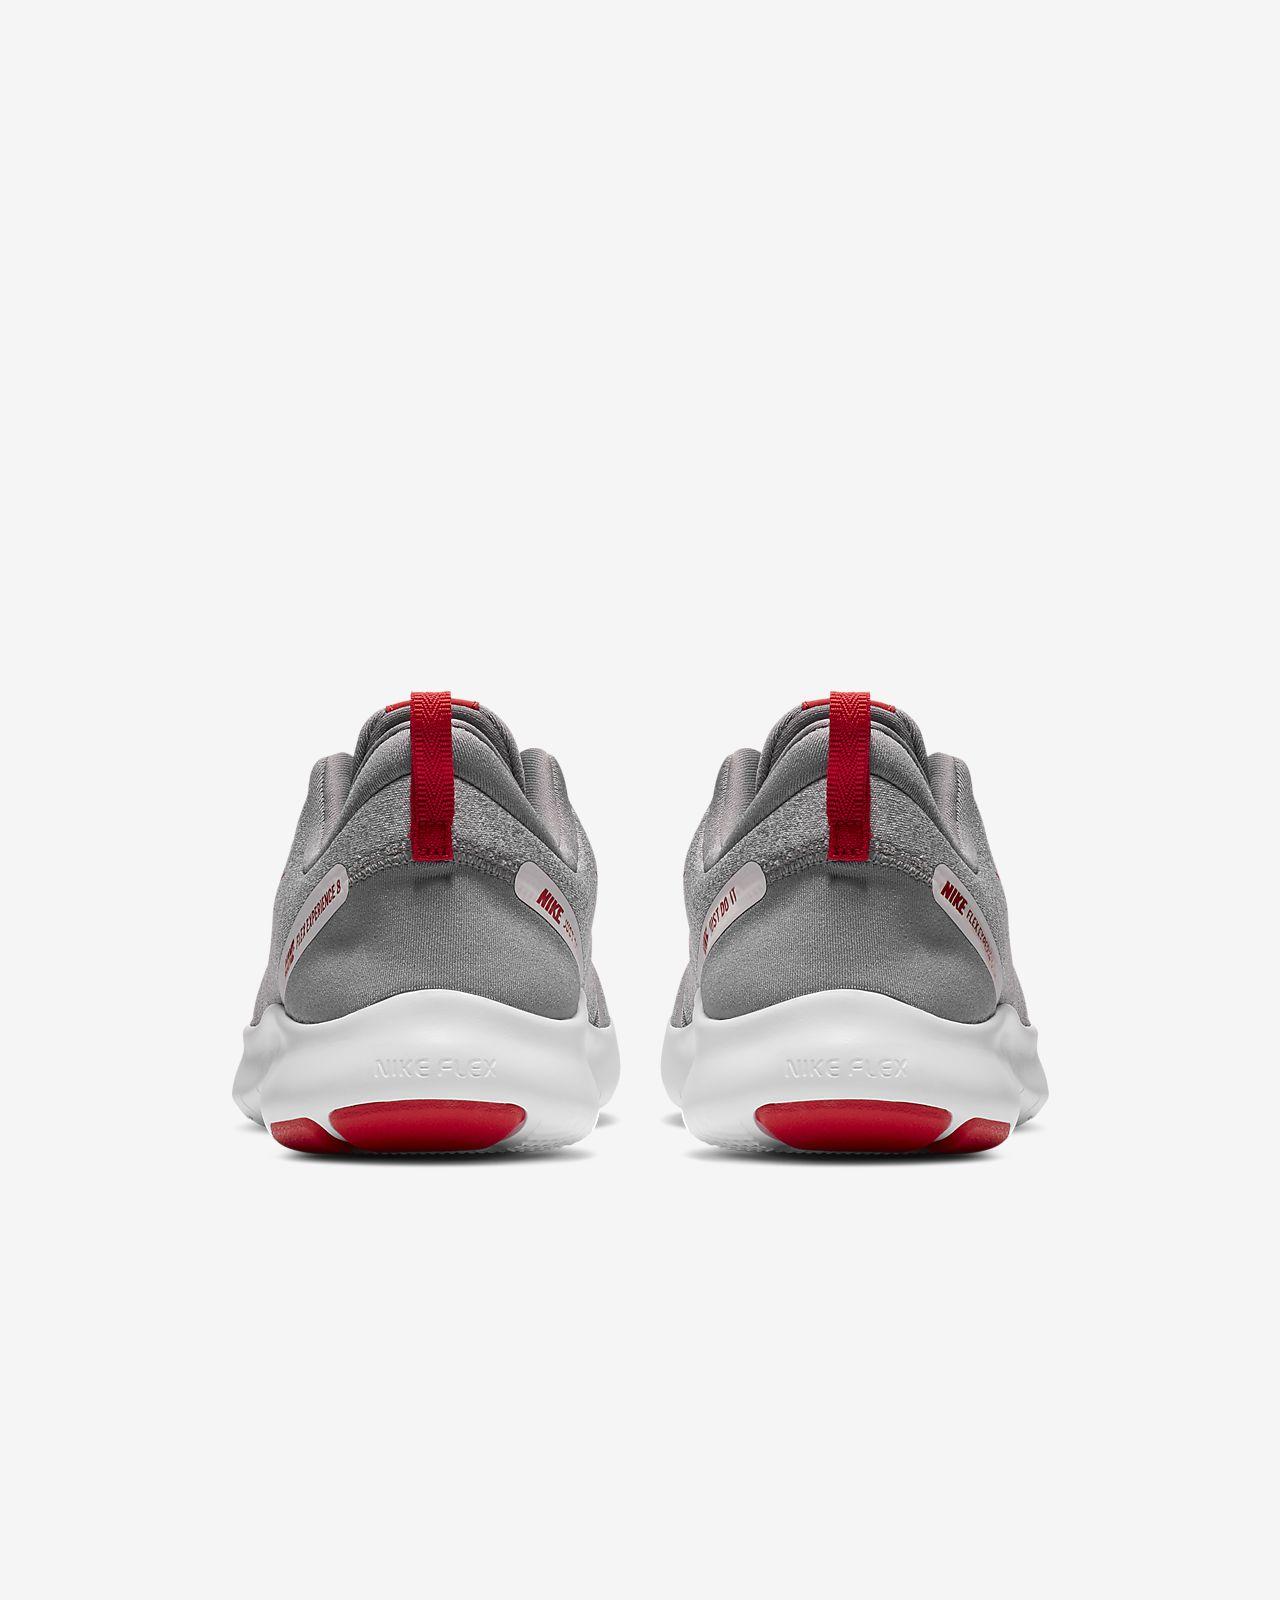 huge discount 4ff86 c4ec7 ... Nike Flex Experience RN 8 Men s Running Shoe